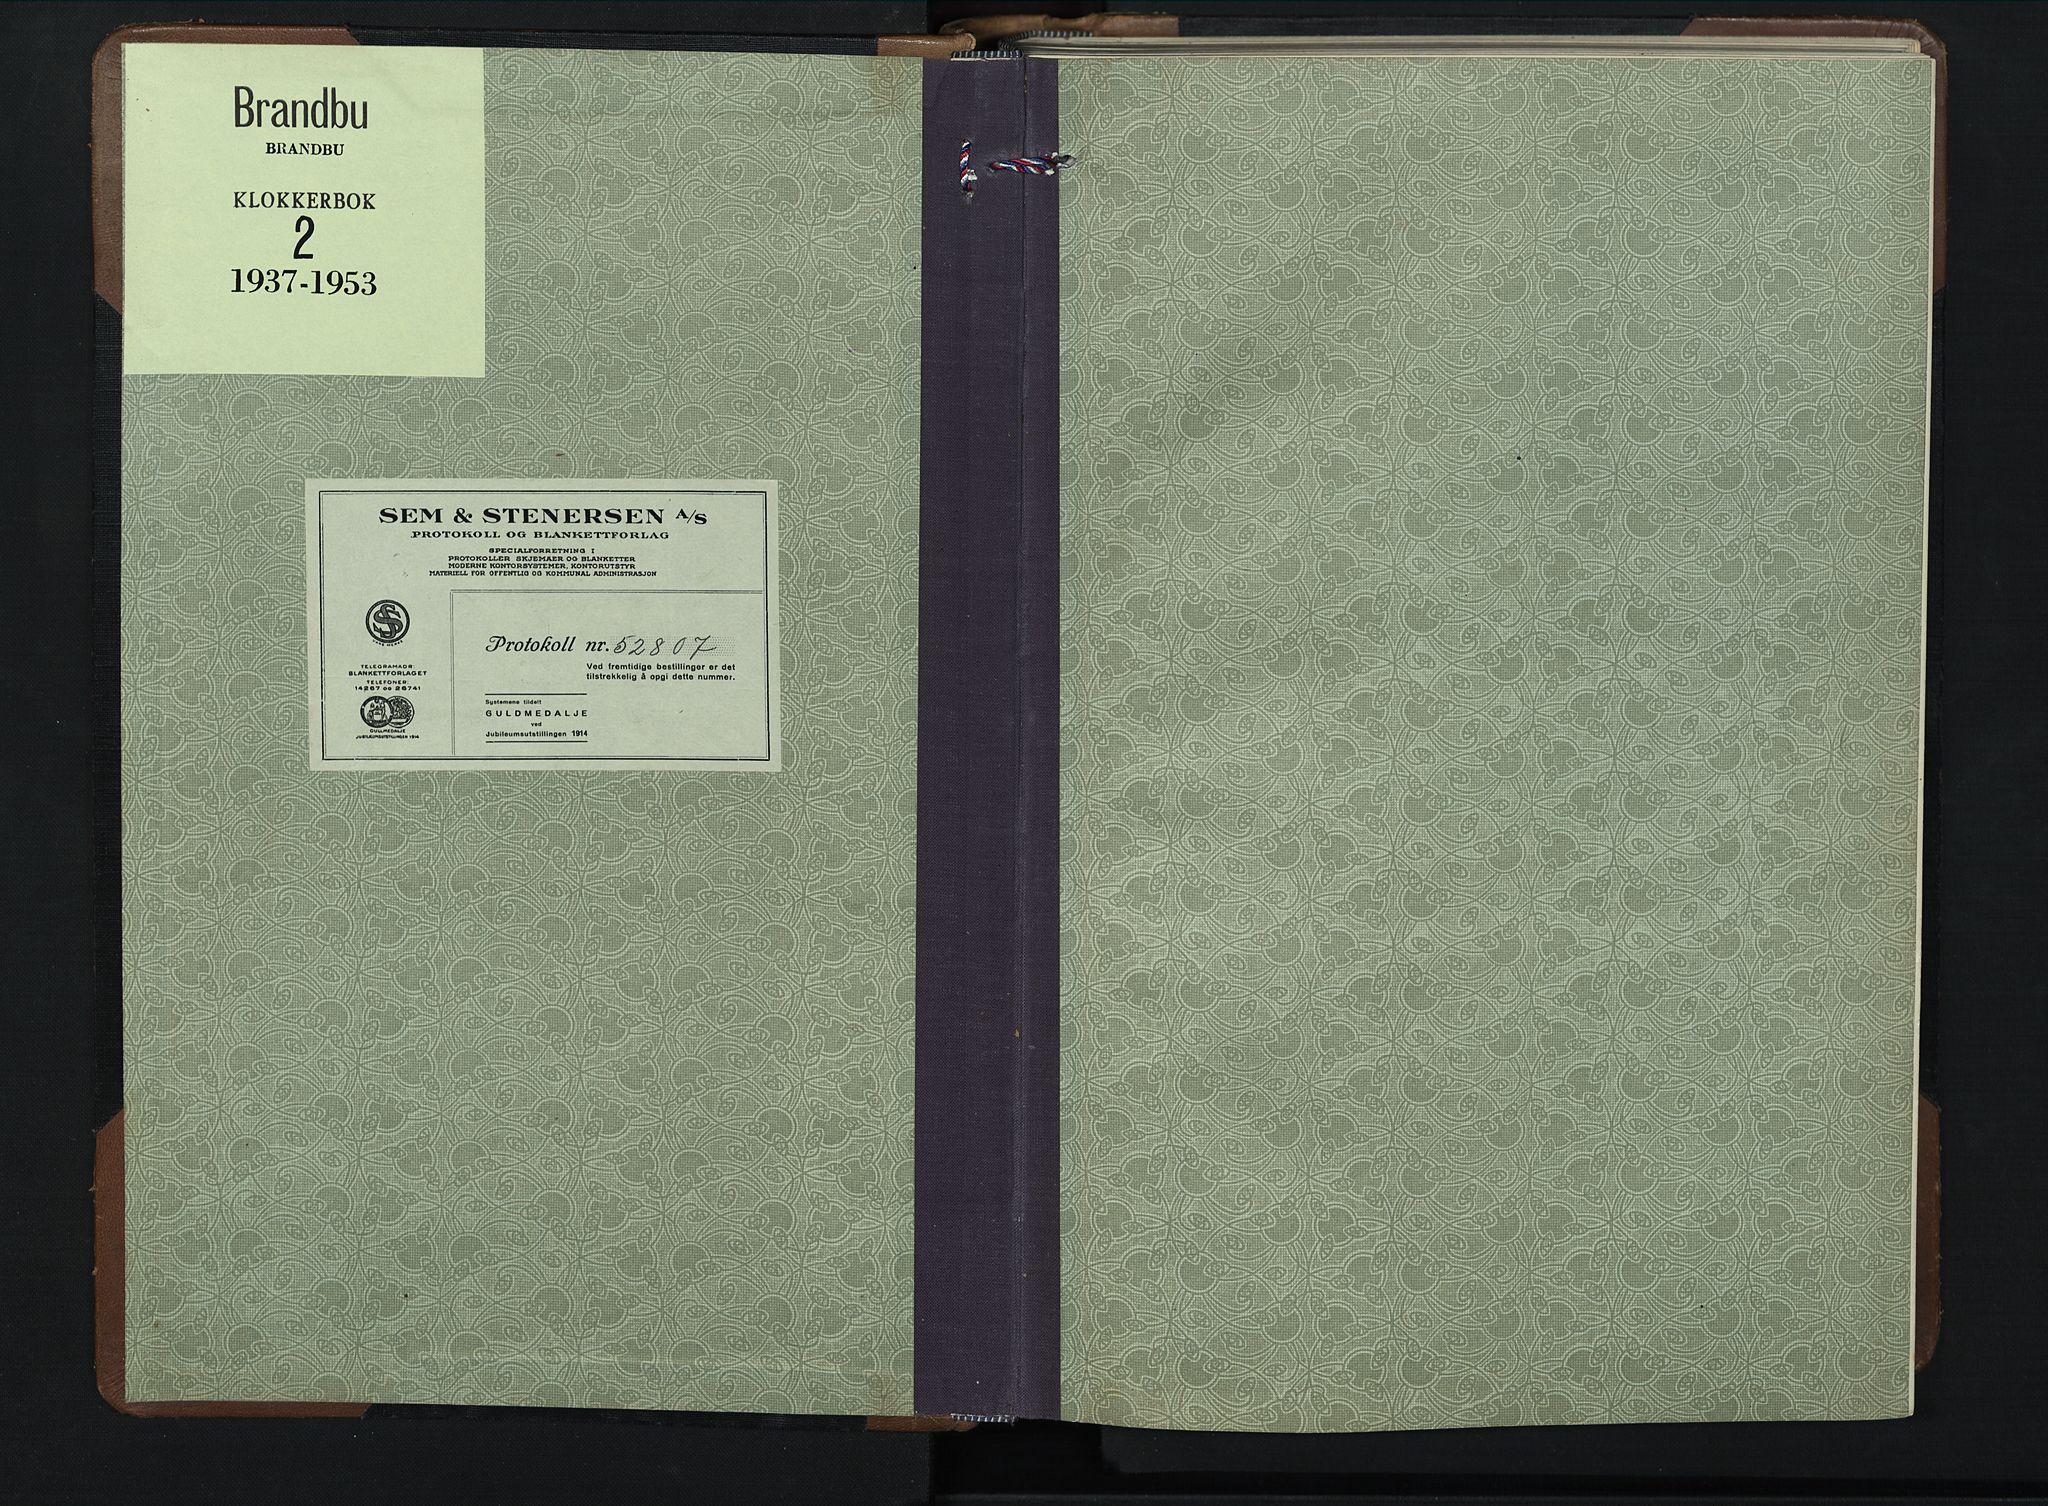 SAH, Brandbu prestekontor, Klokkerbok nr. 2, 1937-1953